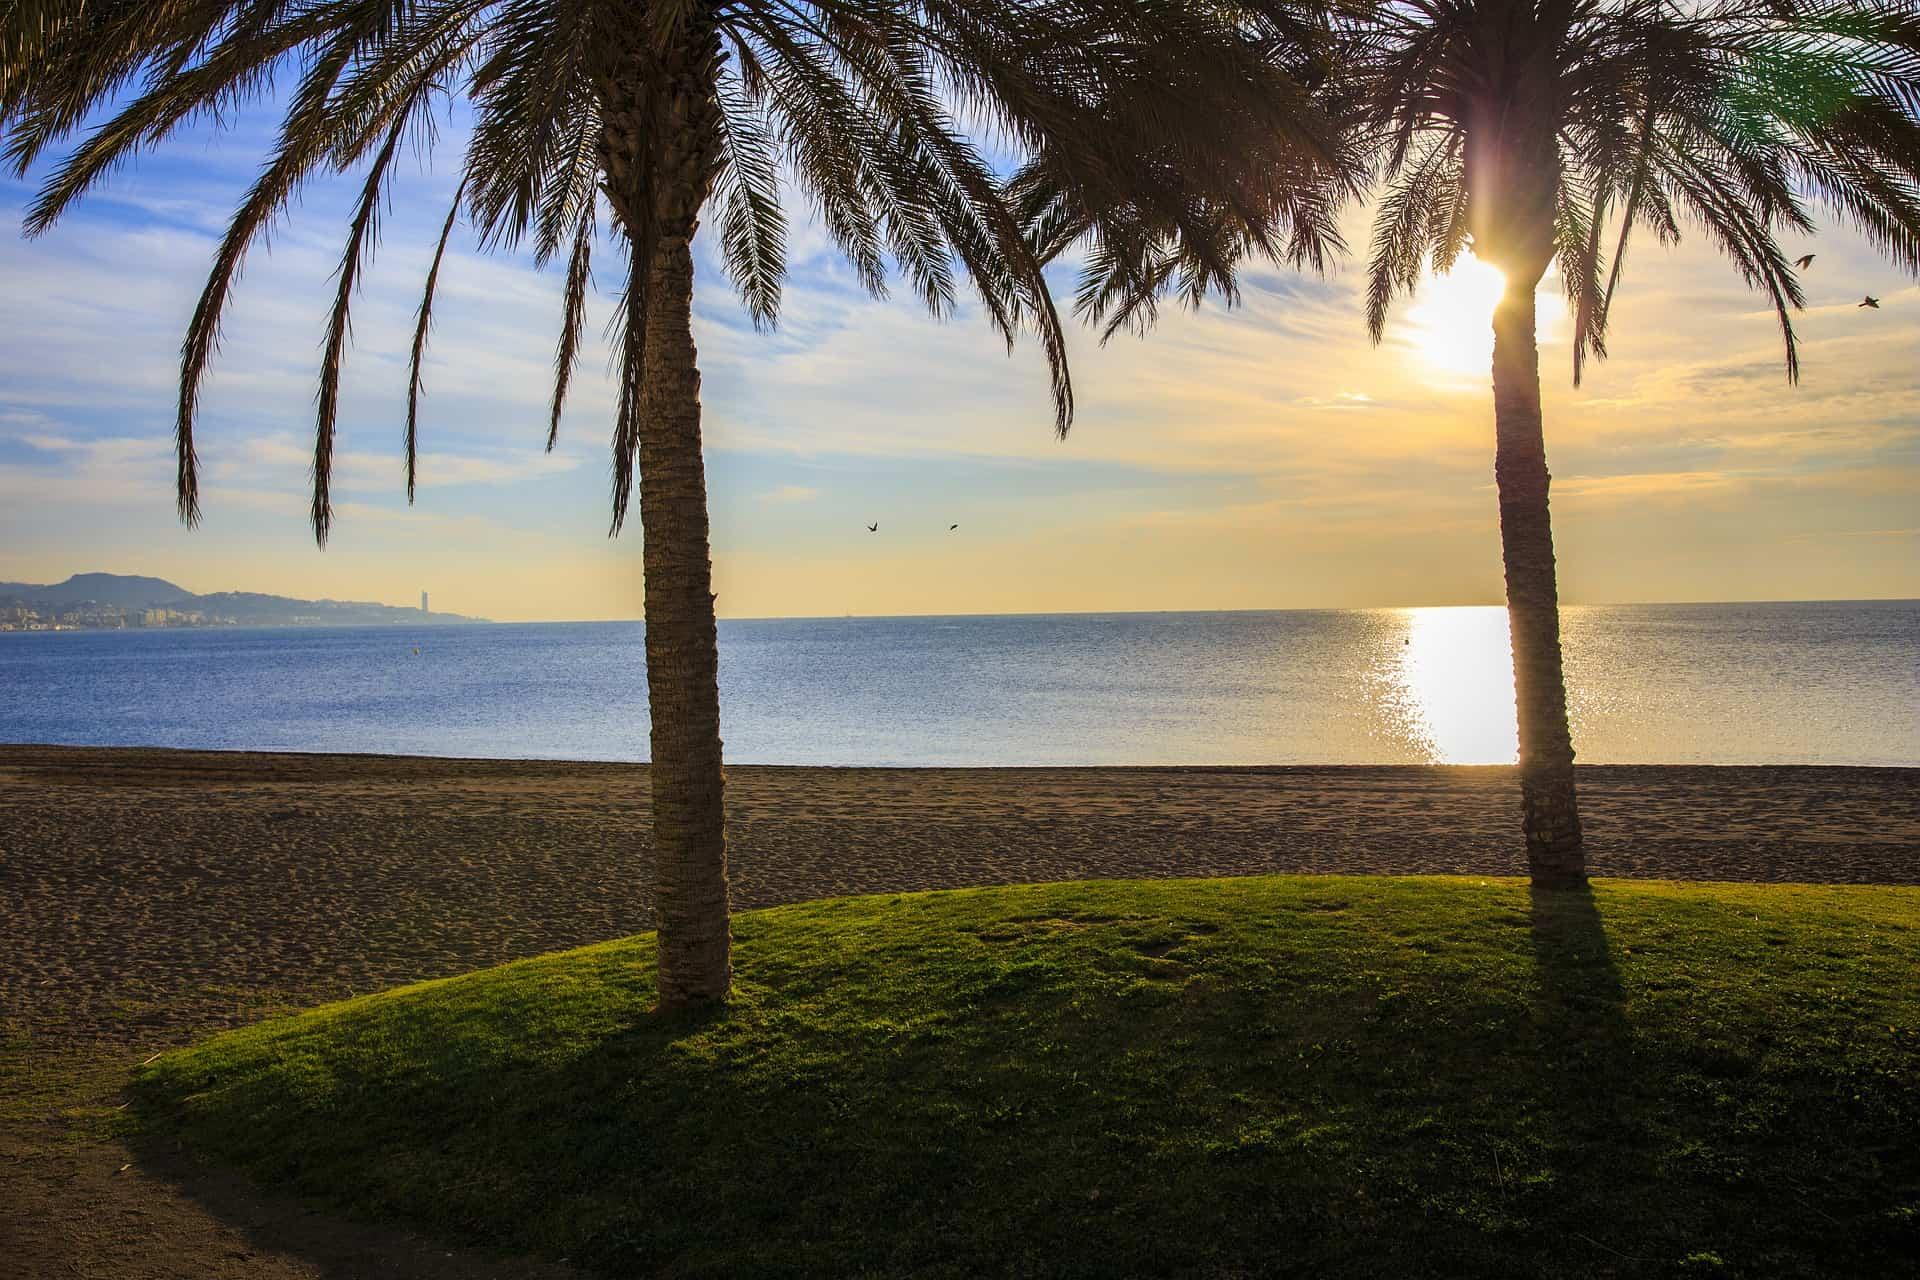 Malaga Städtetrip - nur 70,00€ Flug & Hotel 4 Nächte